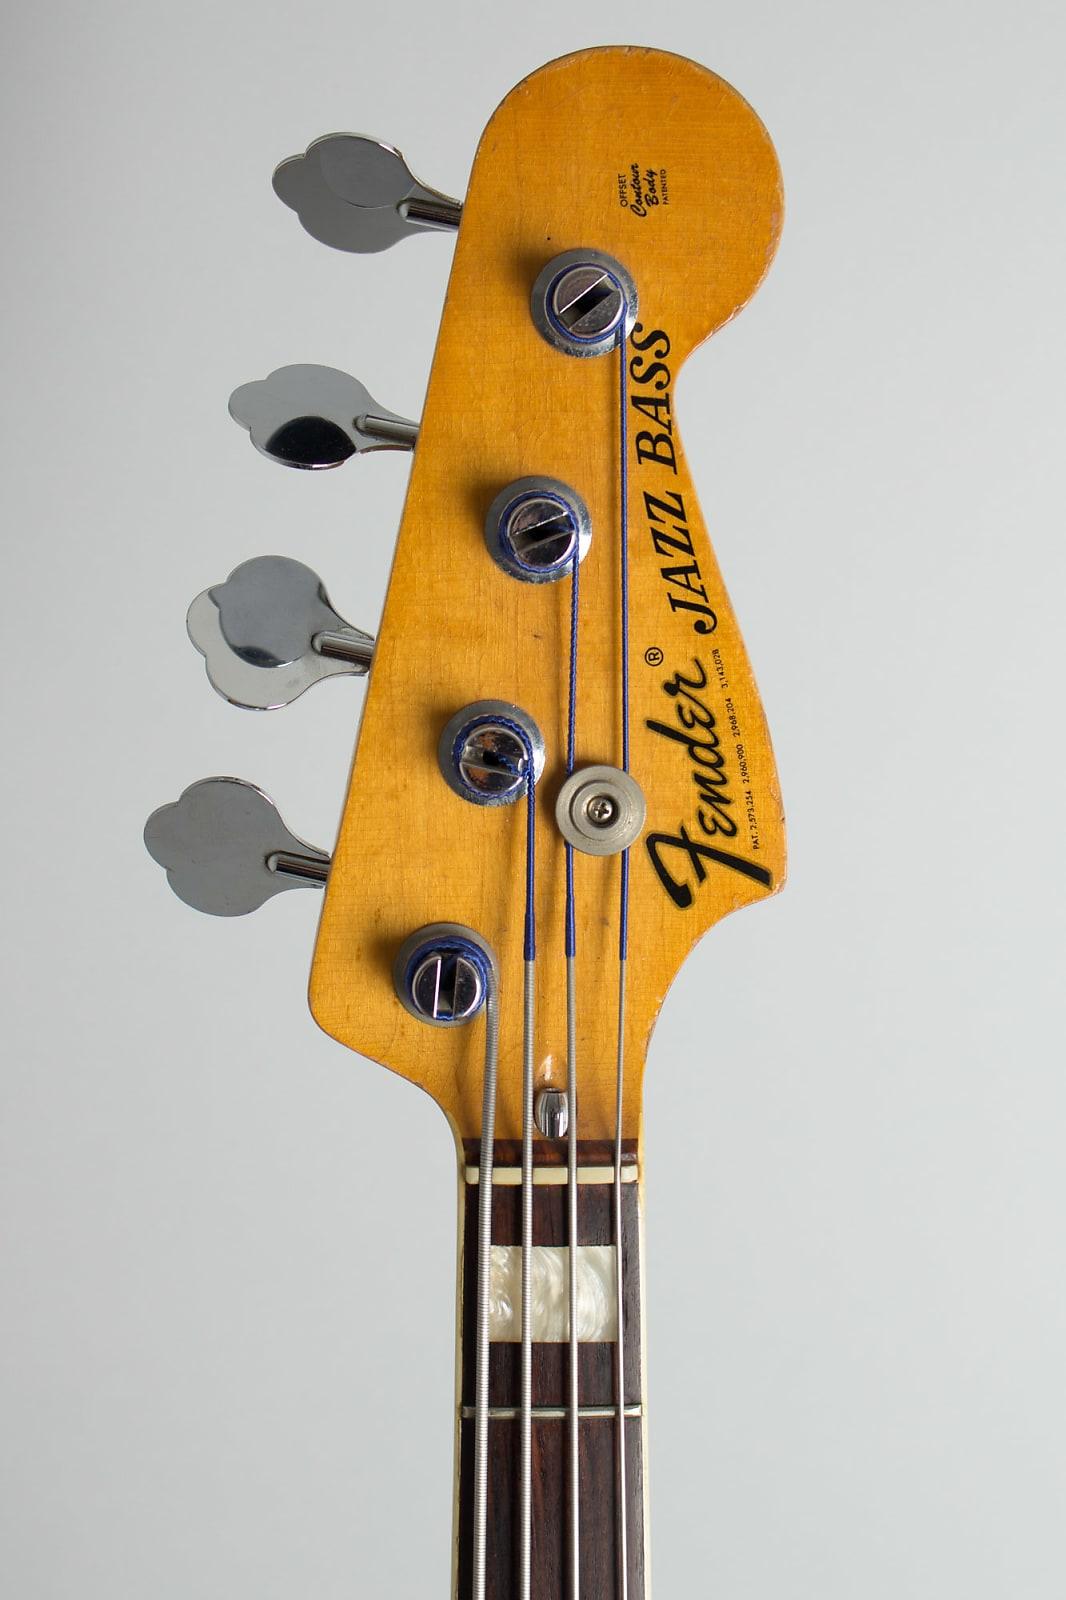 Fender  Jazz Bass Solid Body Electric Bass Guitar (1976), ser. #694649, black gig bag case.